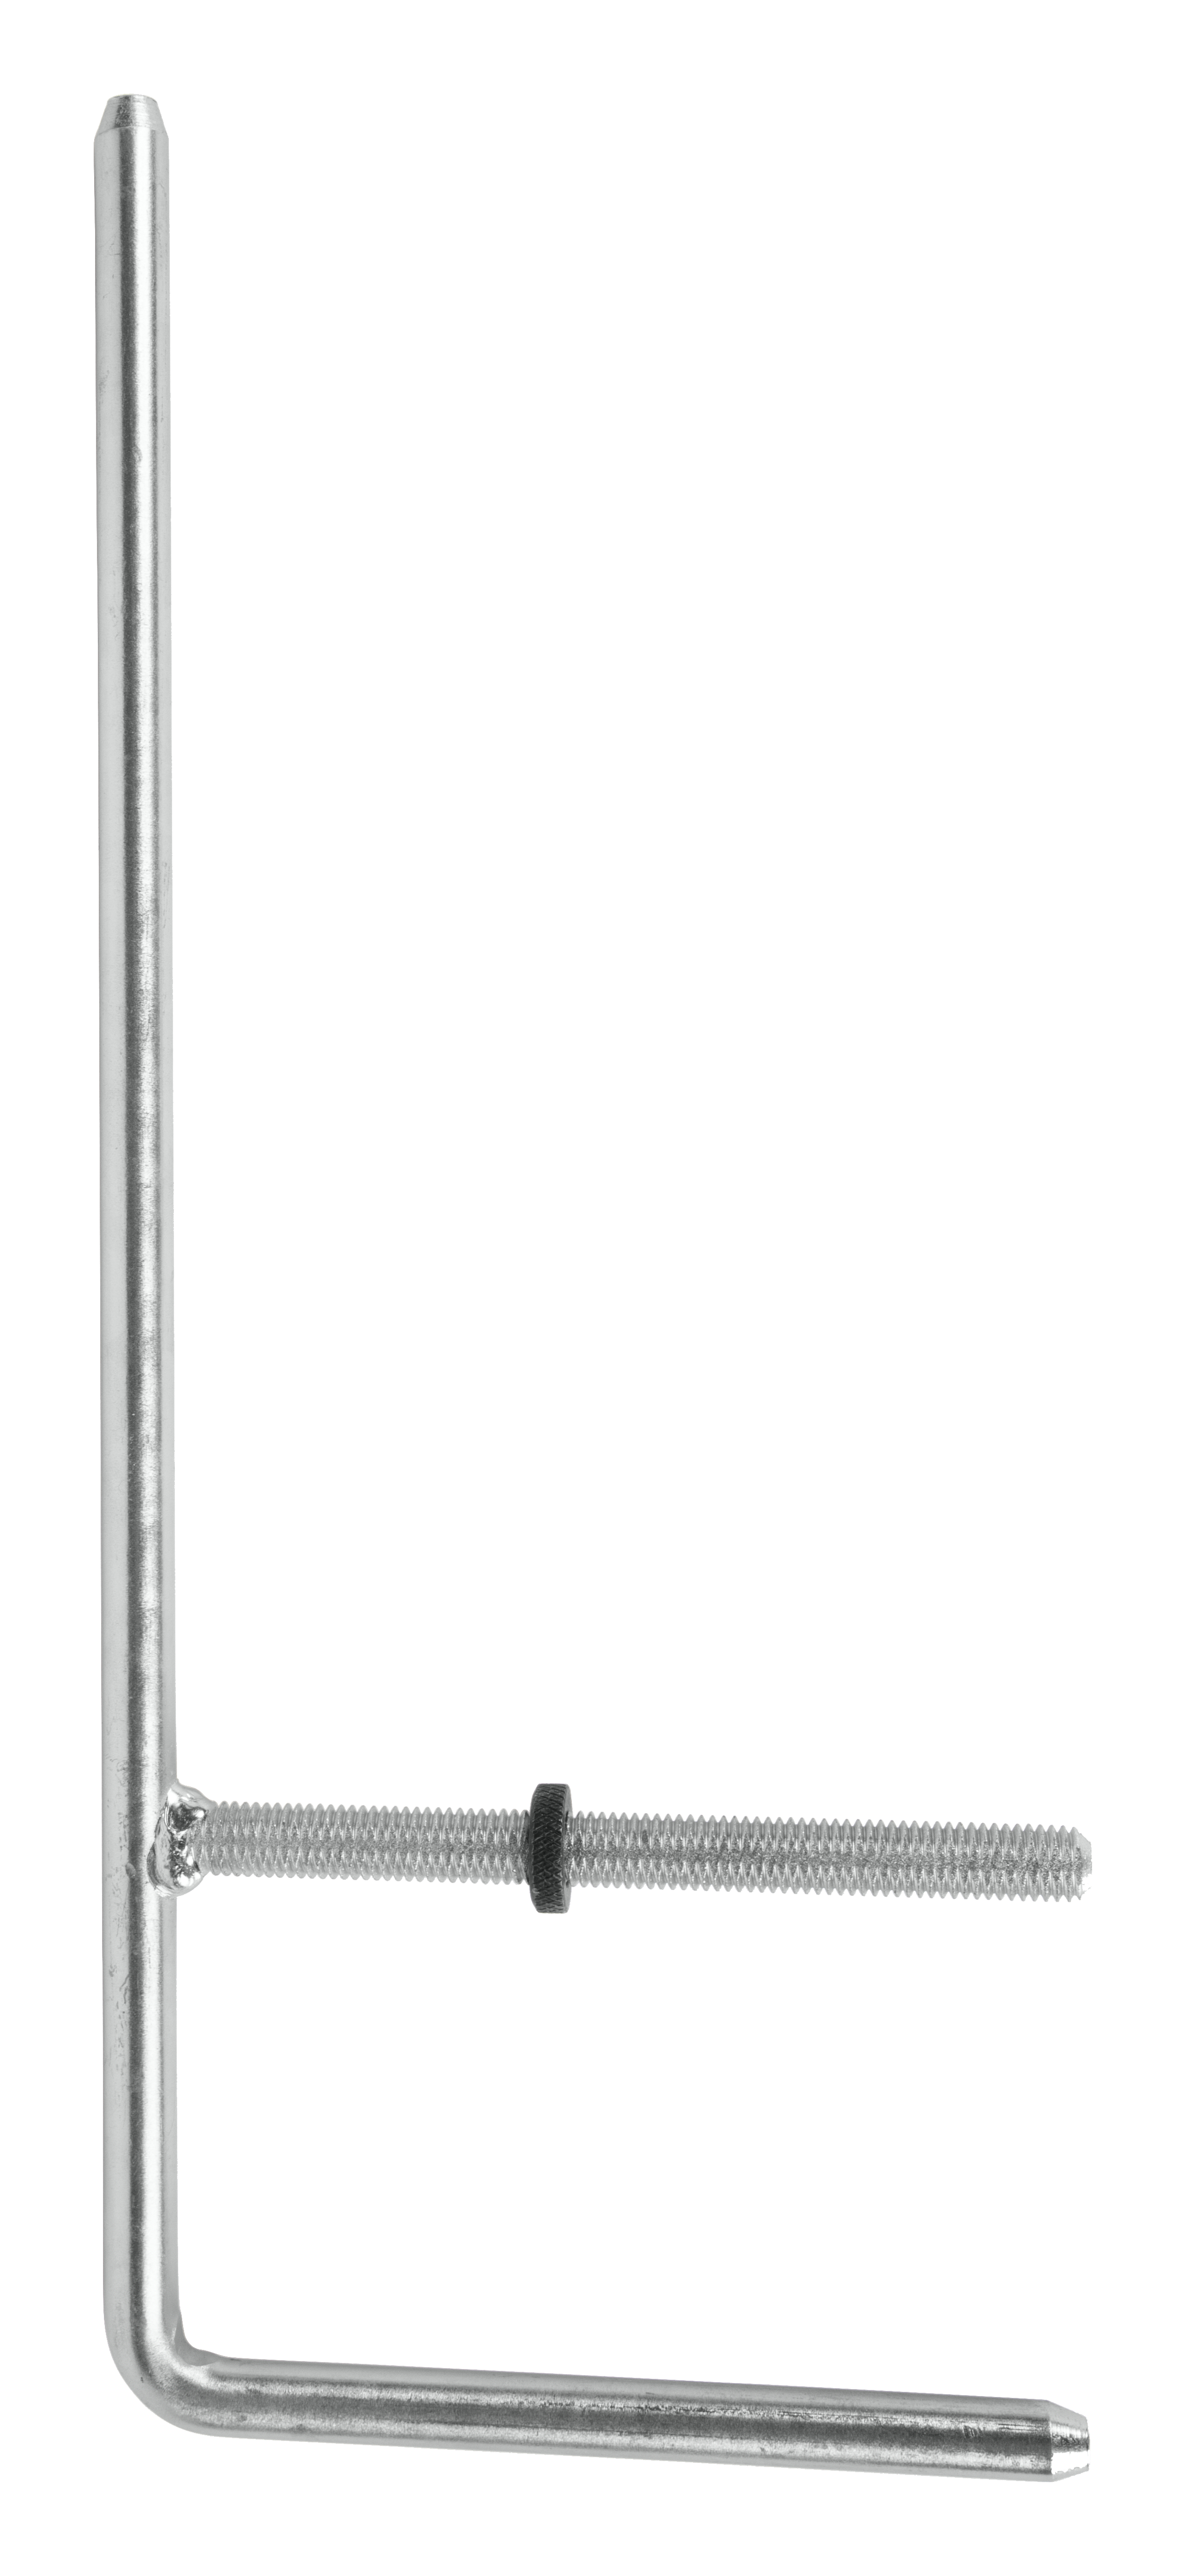 The Jet JWS-10 Support Arm